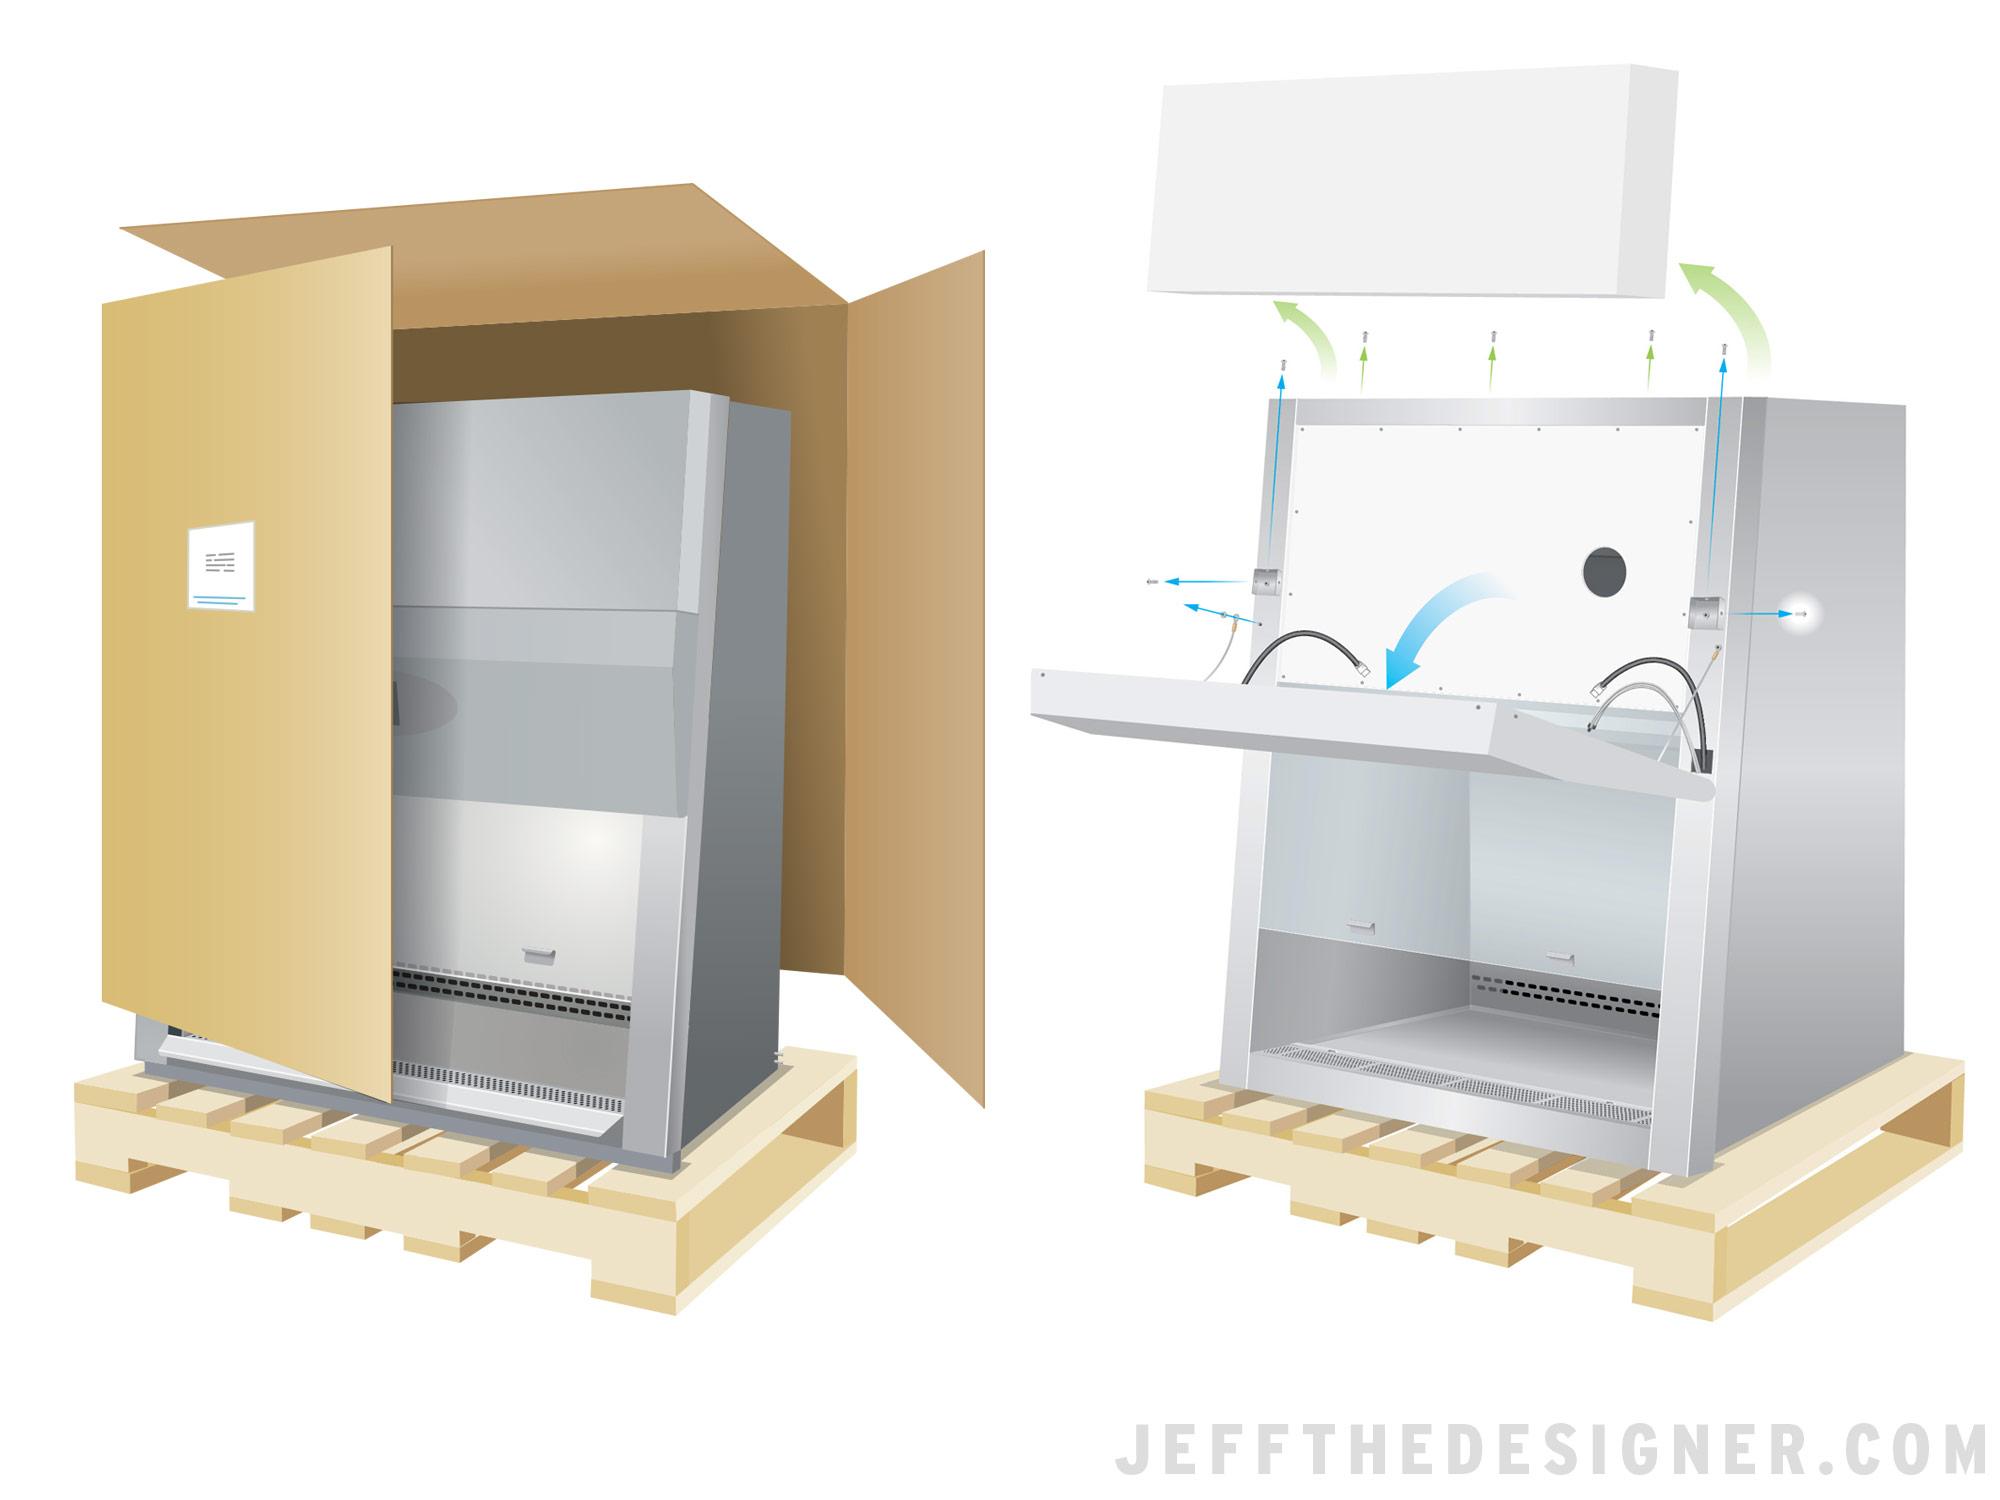 Biological Safety Cabinet Shipping Illustration